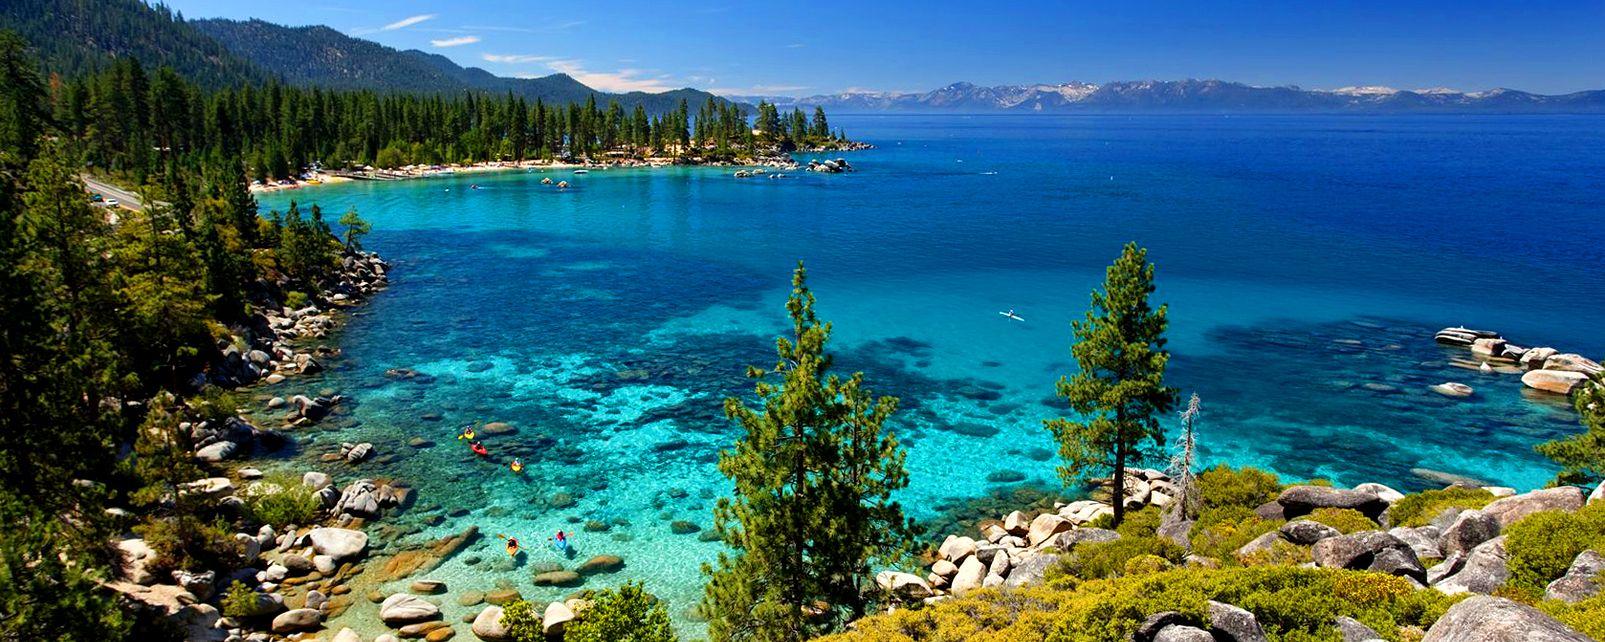 Wallpaper Hd Mu Lac Tahoe Californie Etats Unis